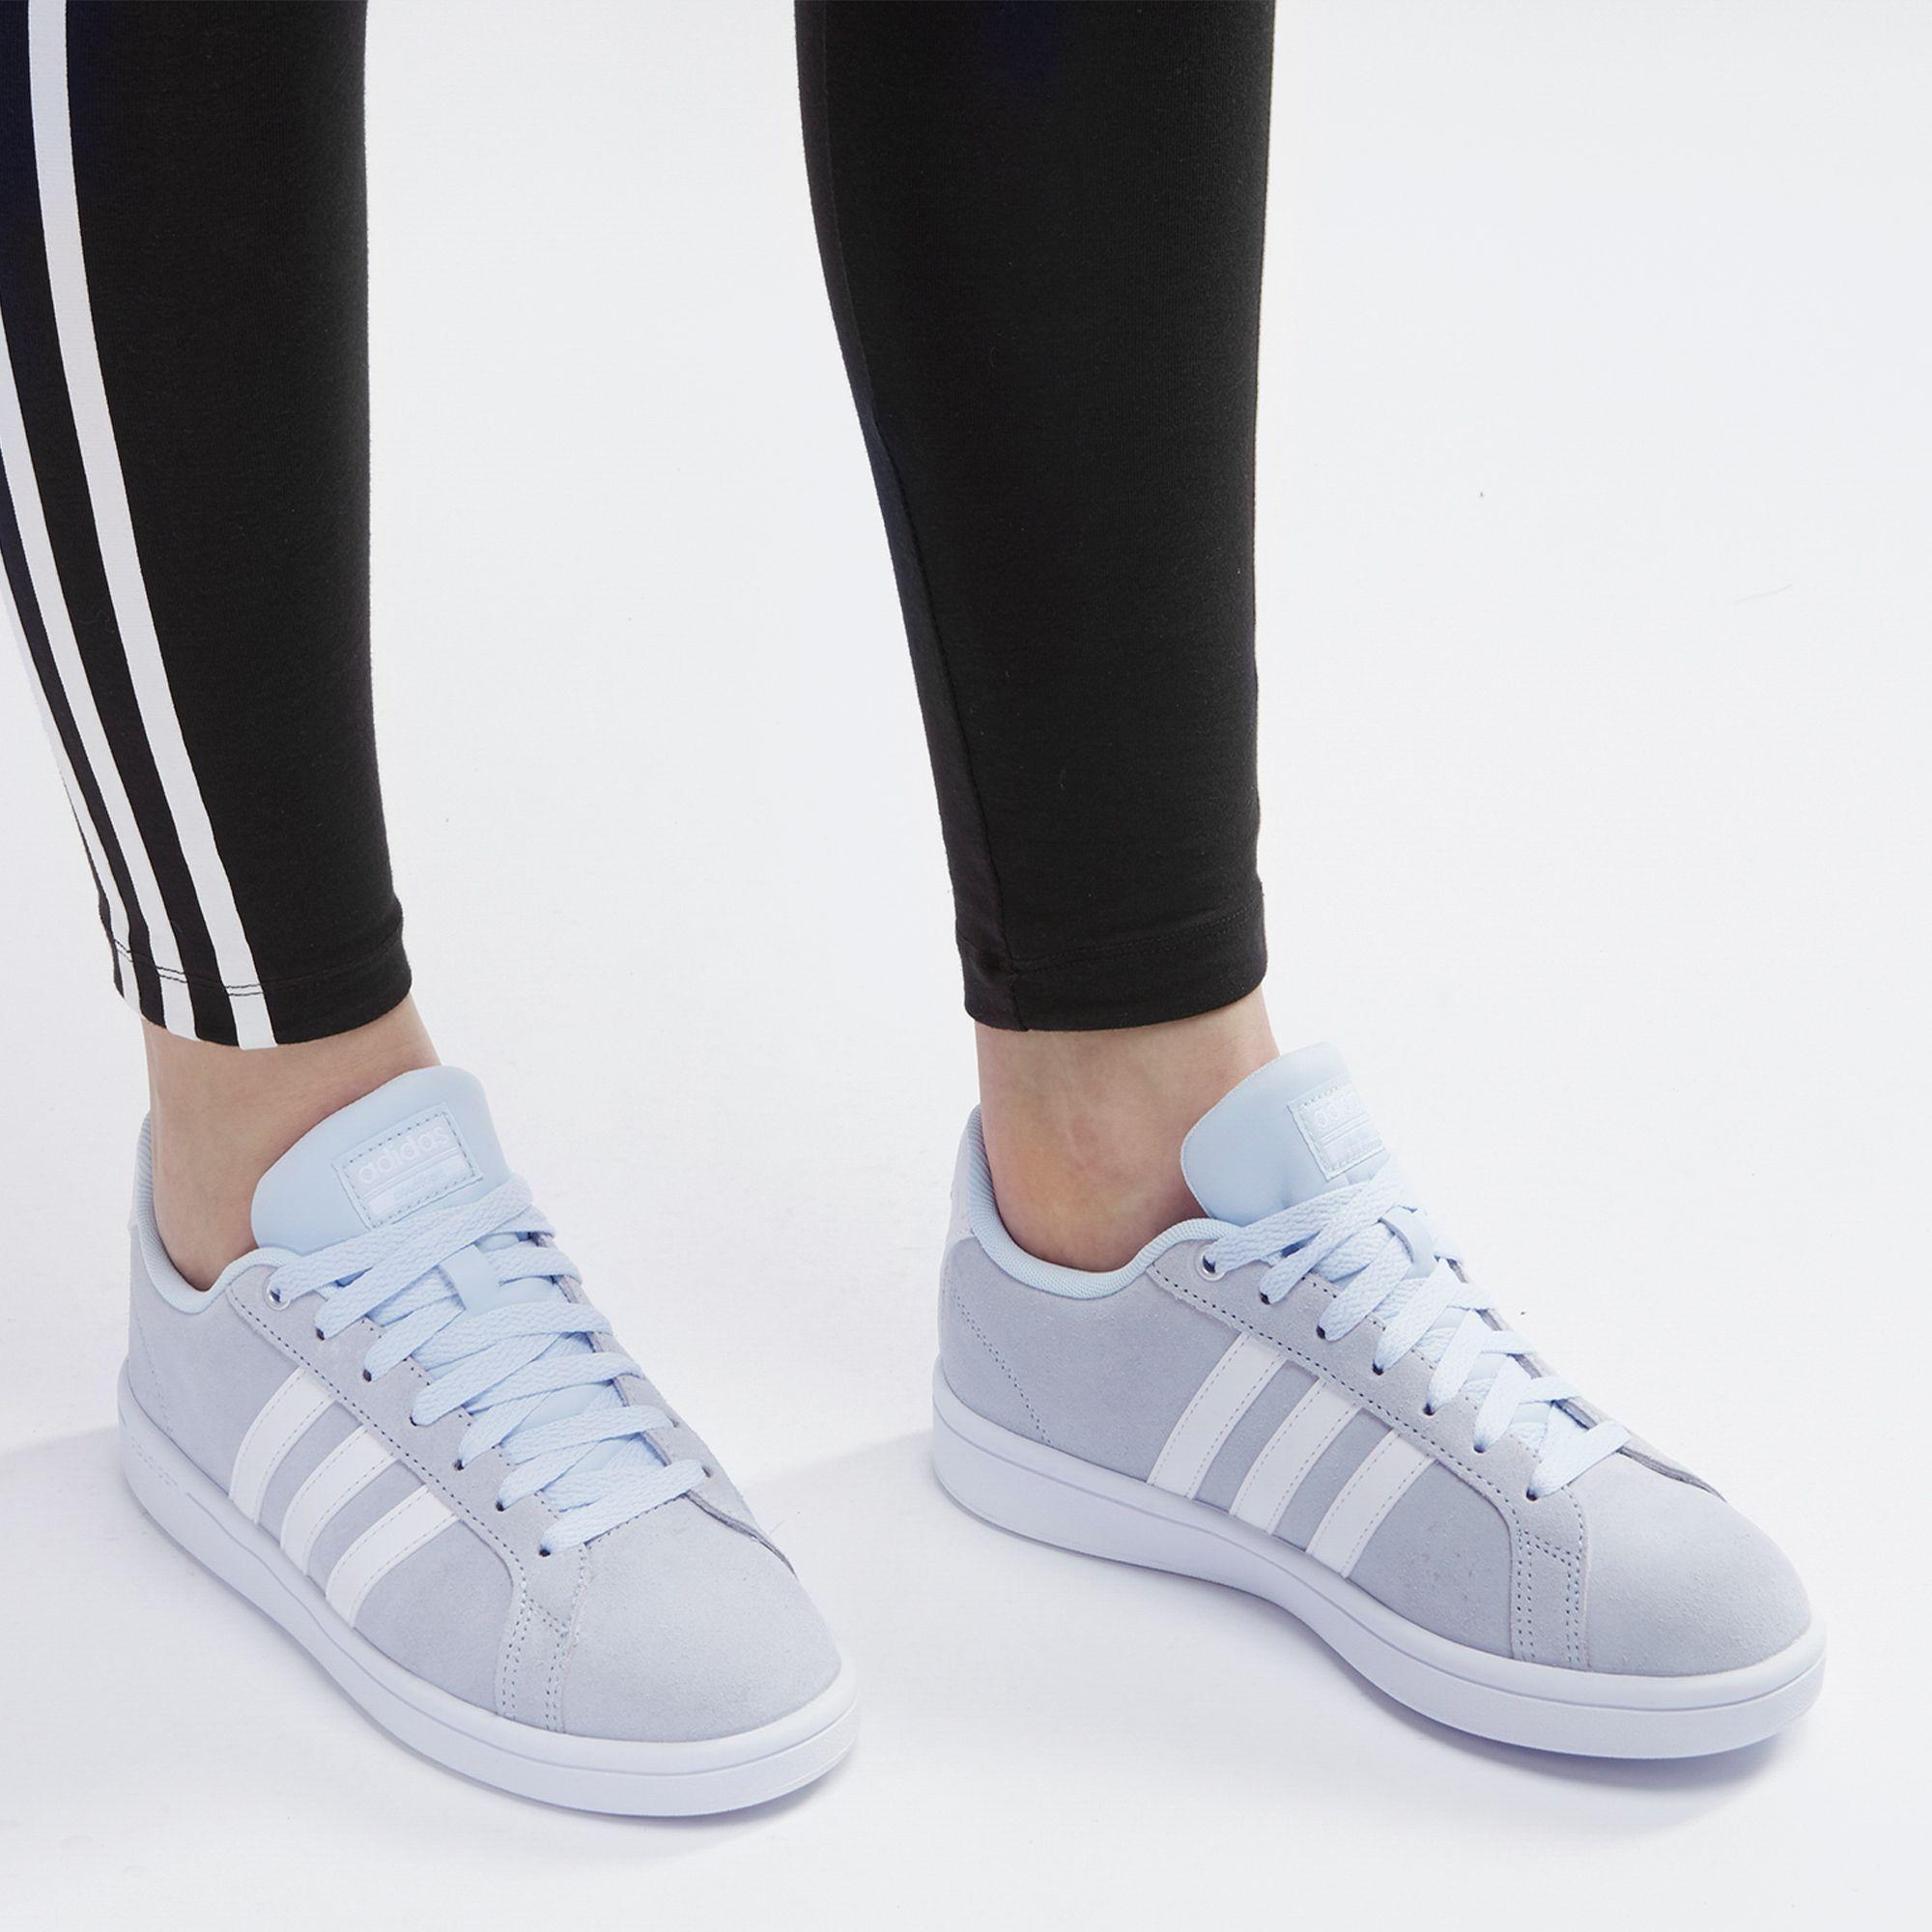 negozio blu adidas cloudfoam vantaggio scarpa per donne dall'adidas sss